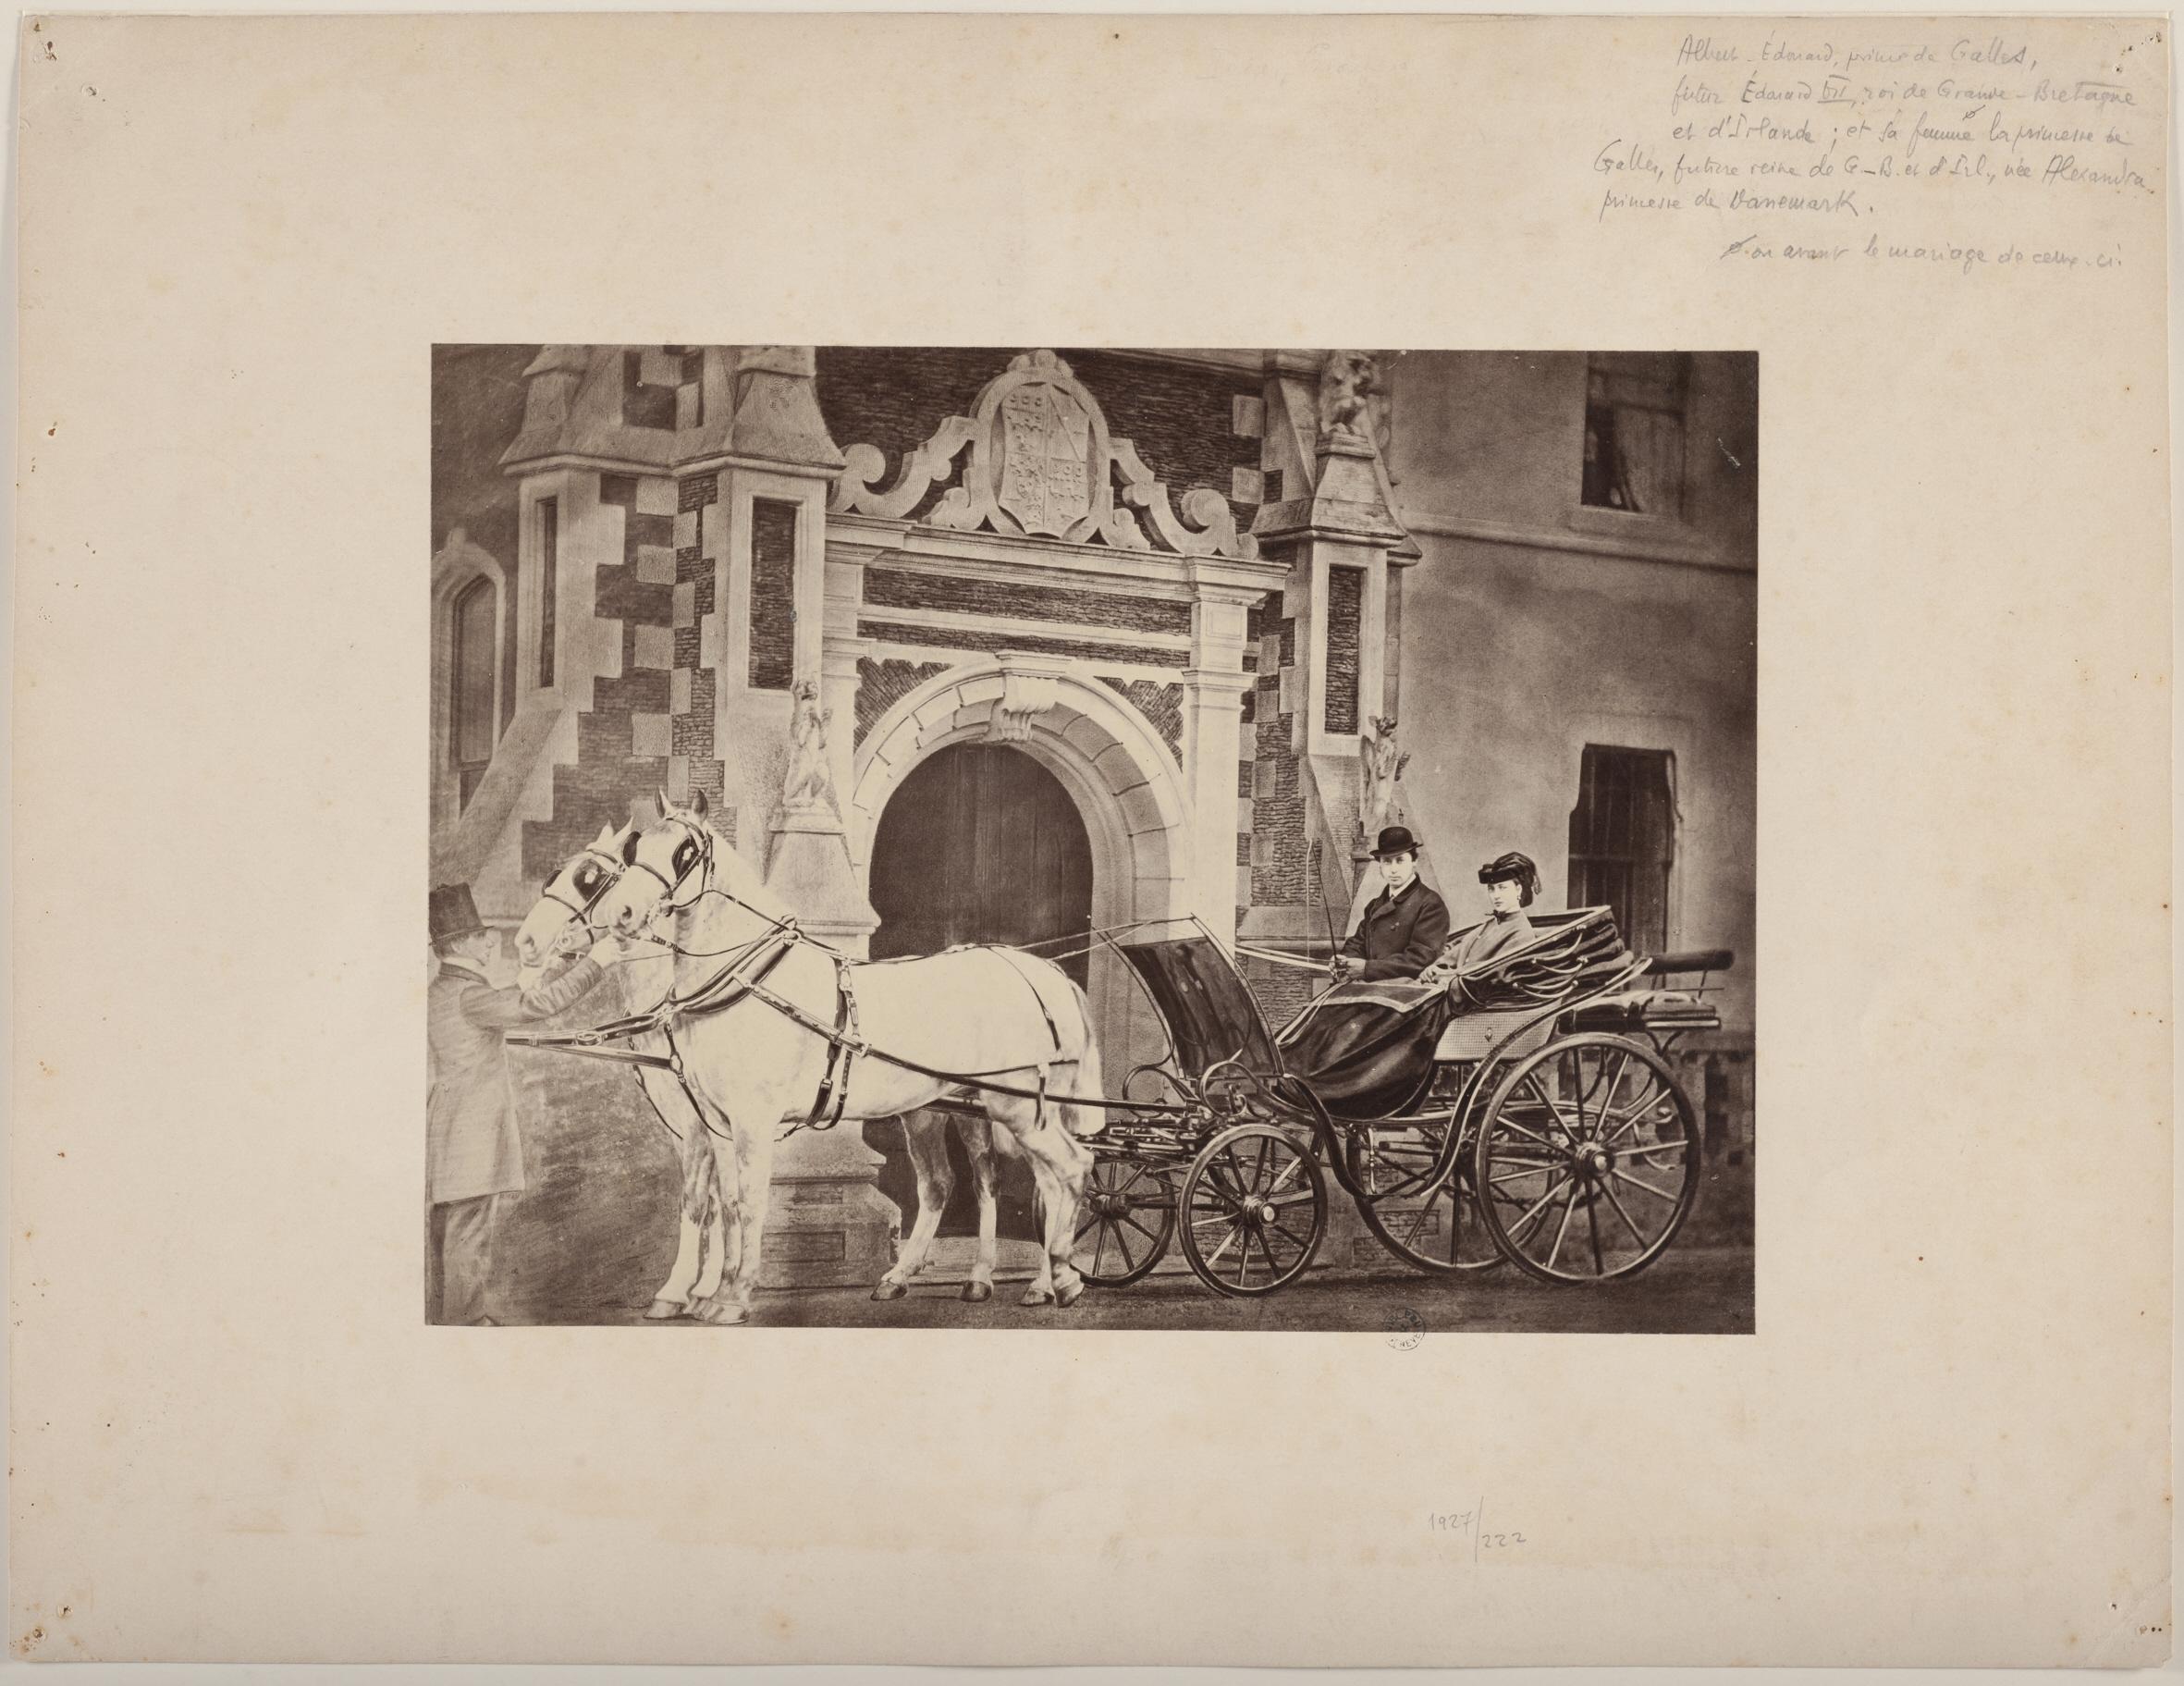 Portrait d'Albert-Edouard, prince de Galles et d'Alexandra, reine d'Angleterre